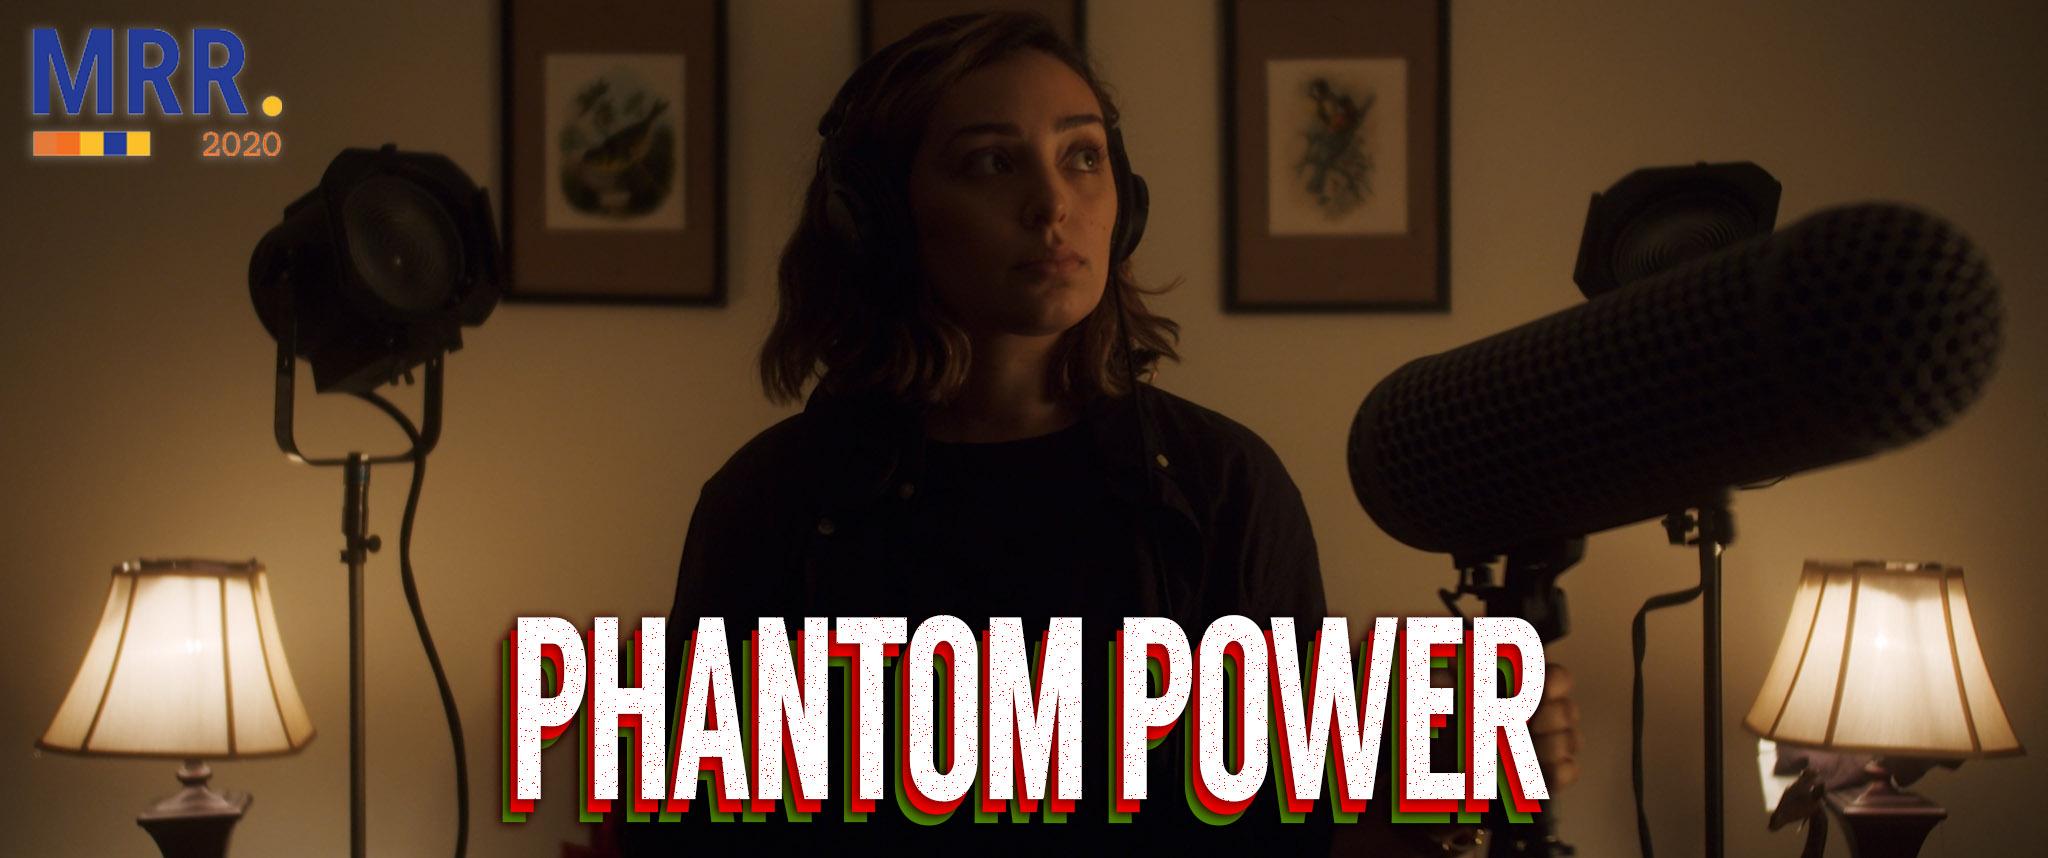 Phantom Power - My Rode Reel 2020